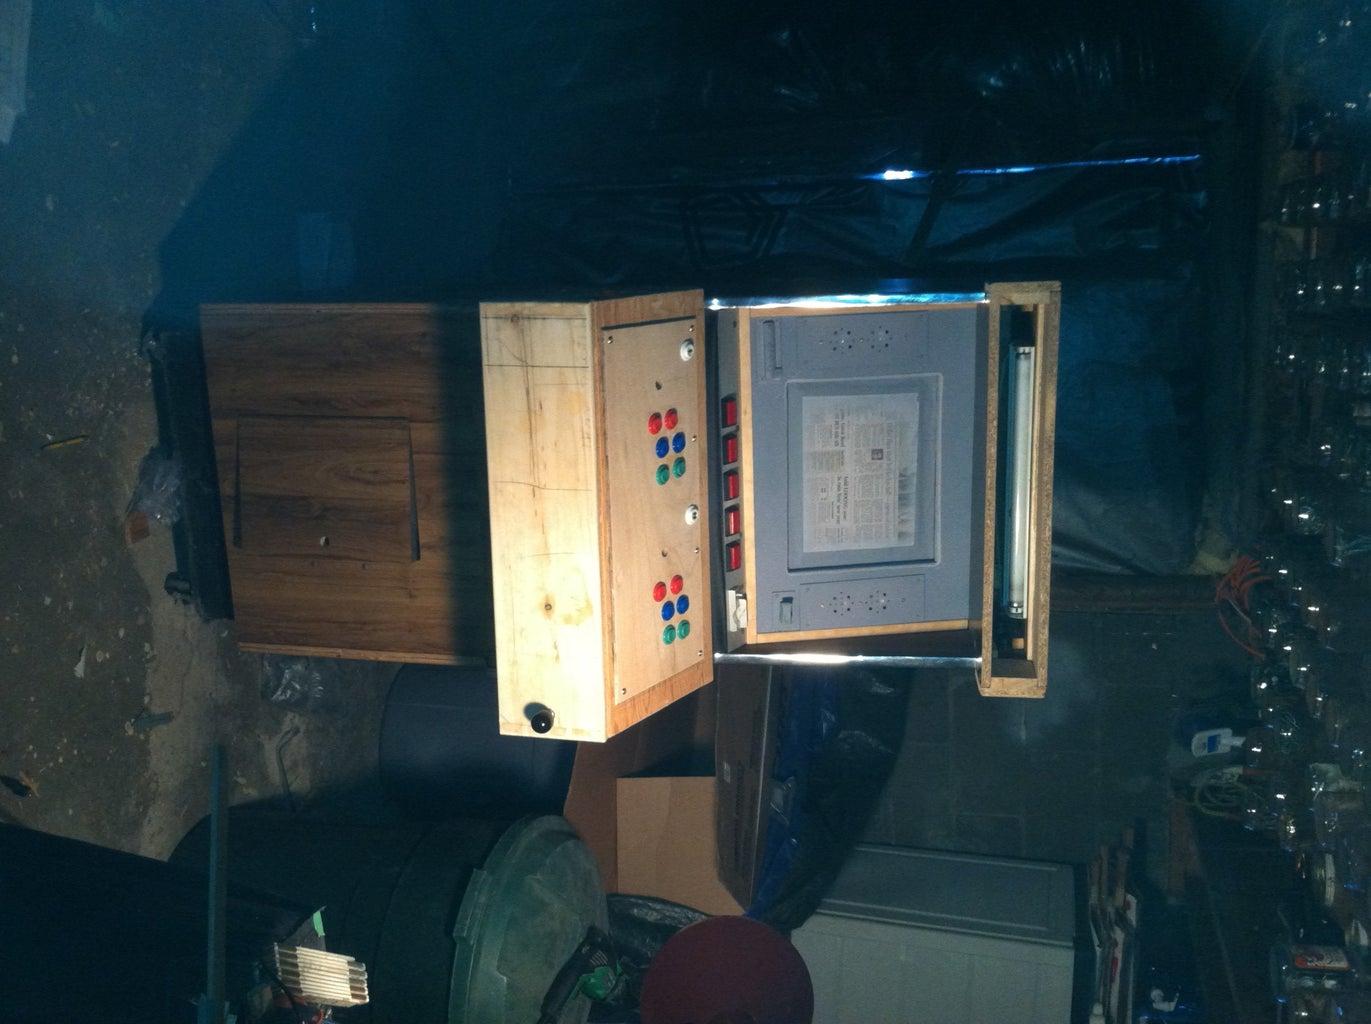 Installing Monitor